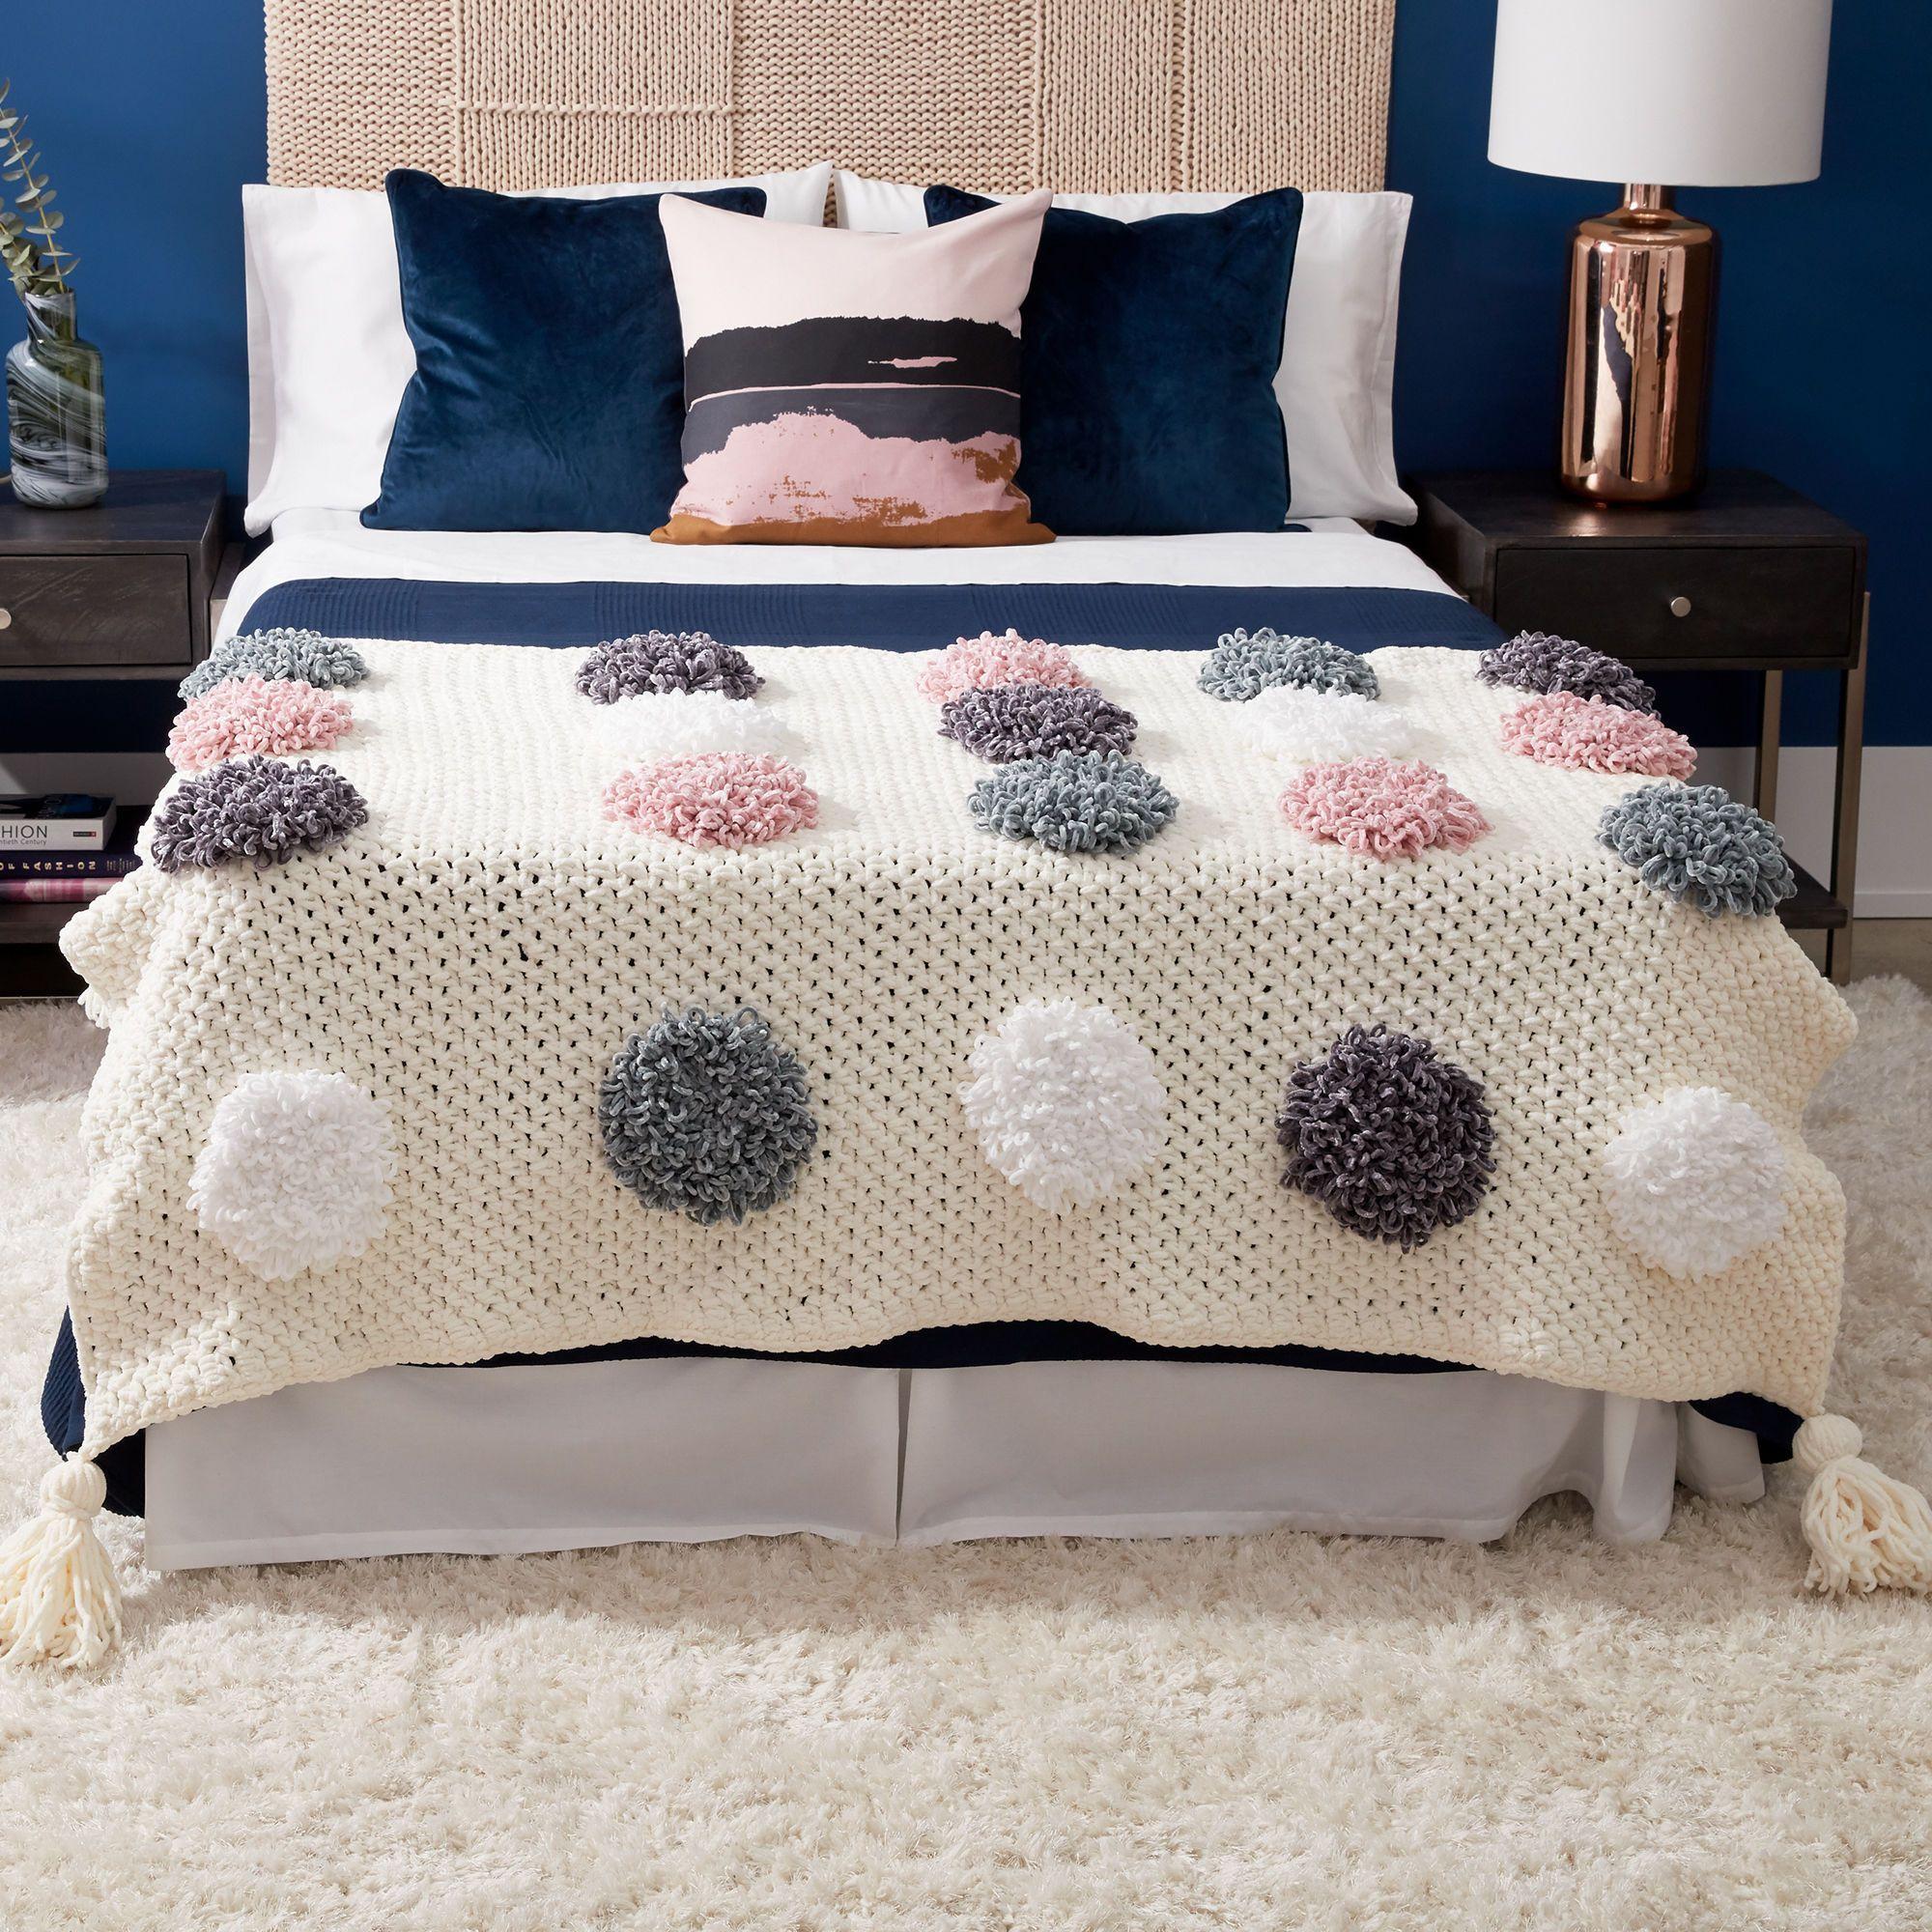 Bernat Loopy Dots Crochet Blanket Pattern | Yarnspirations#bernat #blanket #crochet #dots #loopy #pattern #yarnspirations